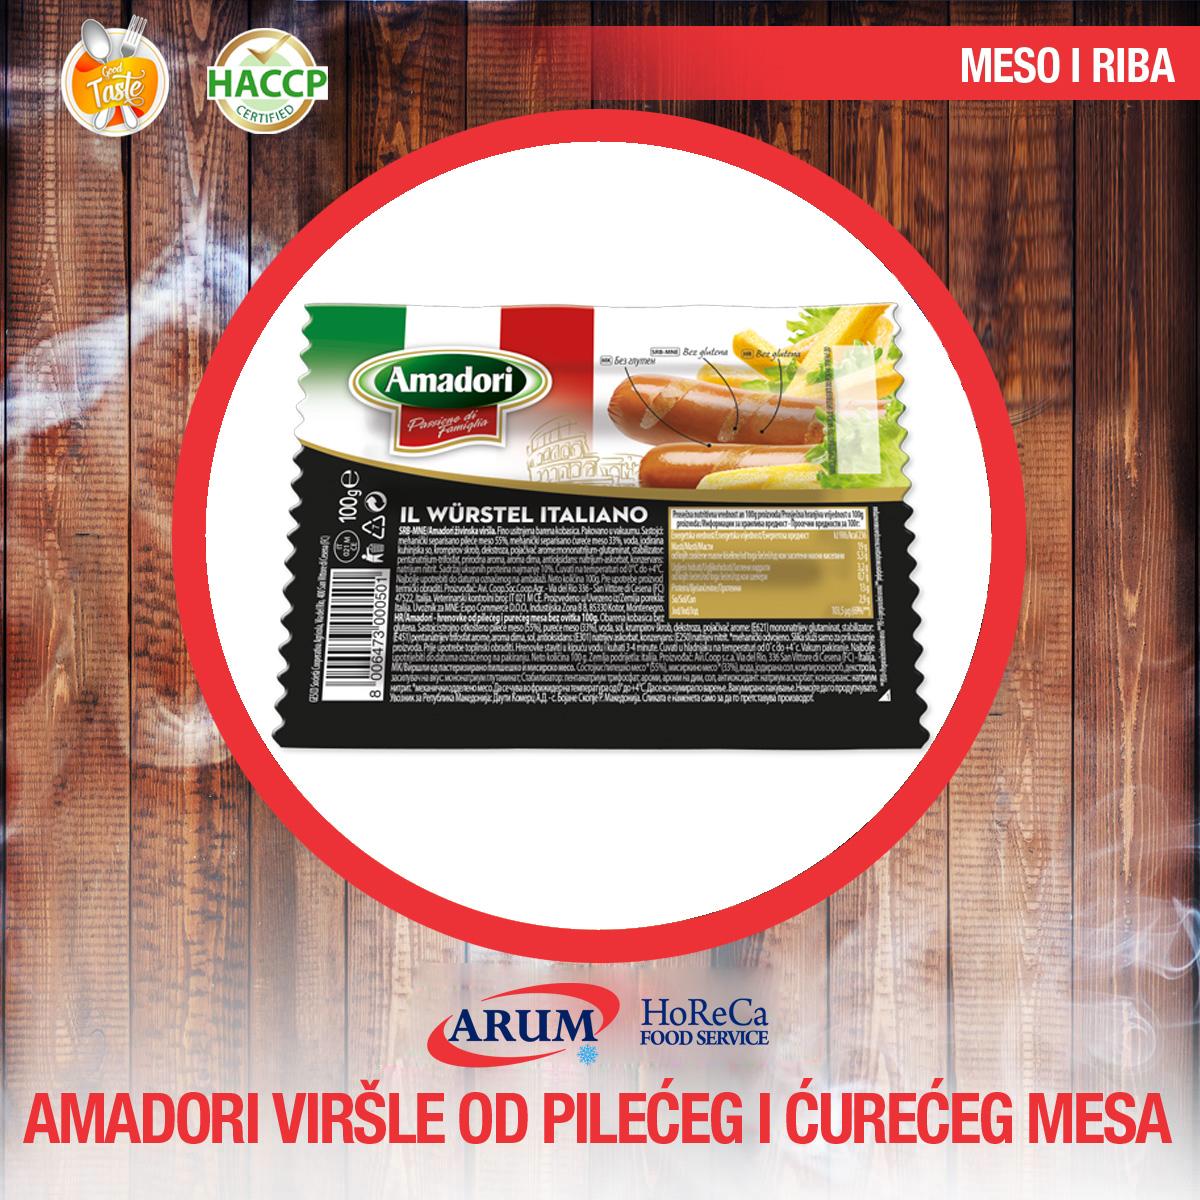 Amadori virsla od pileceg i cureceg mesa 1 kg (4/#)